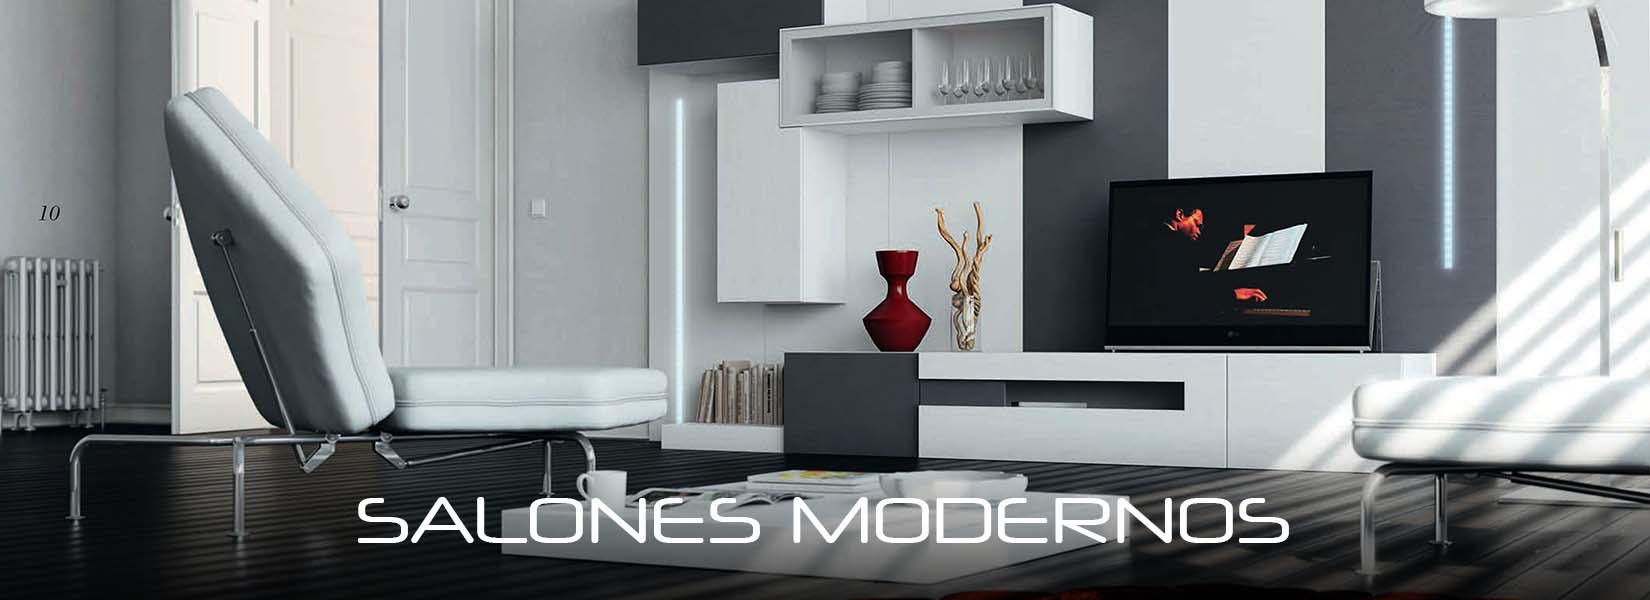 slider_cat_salones_modernos_2